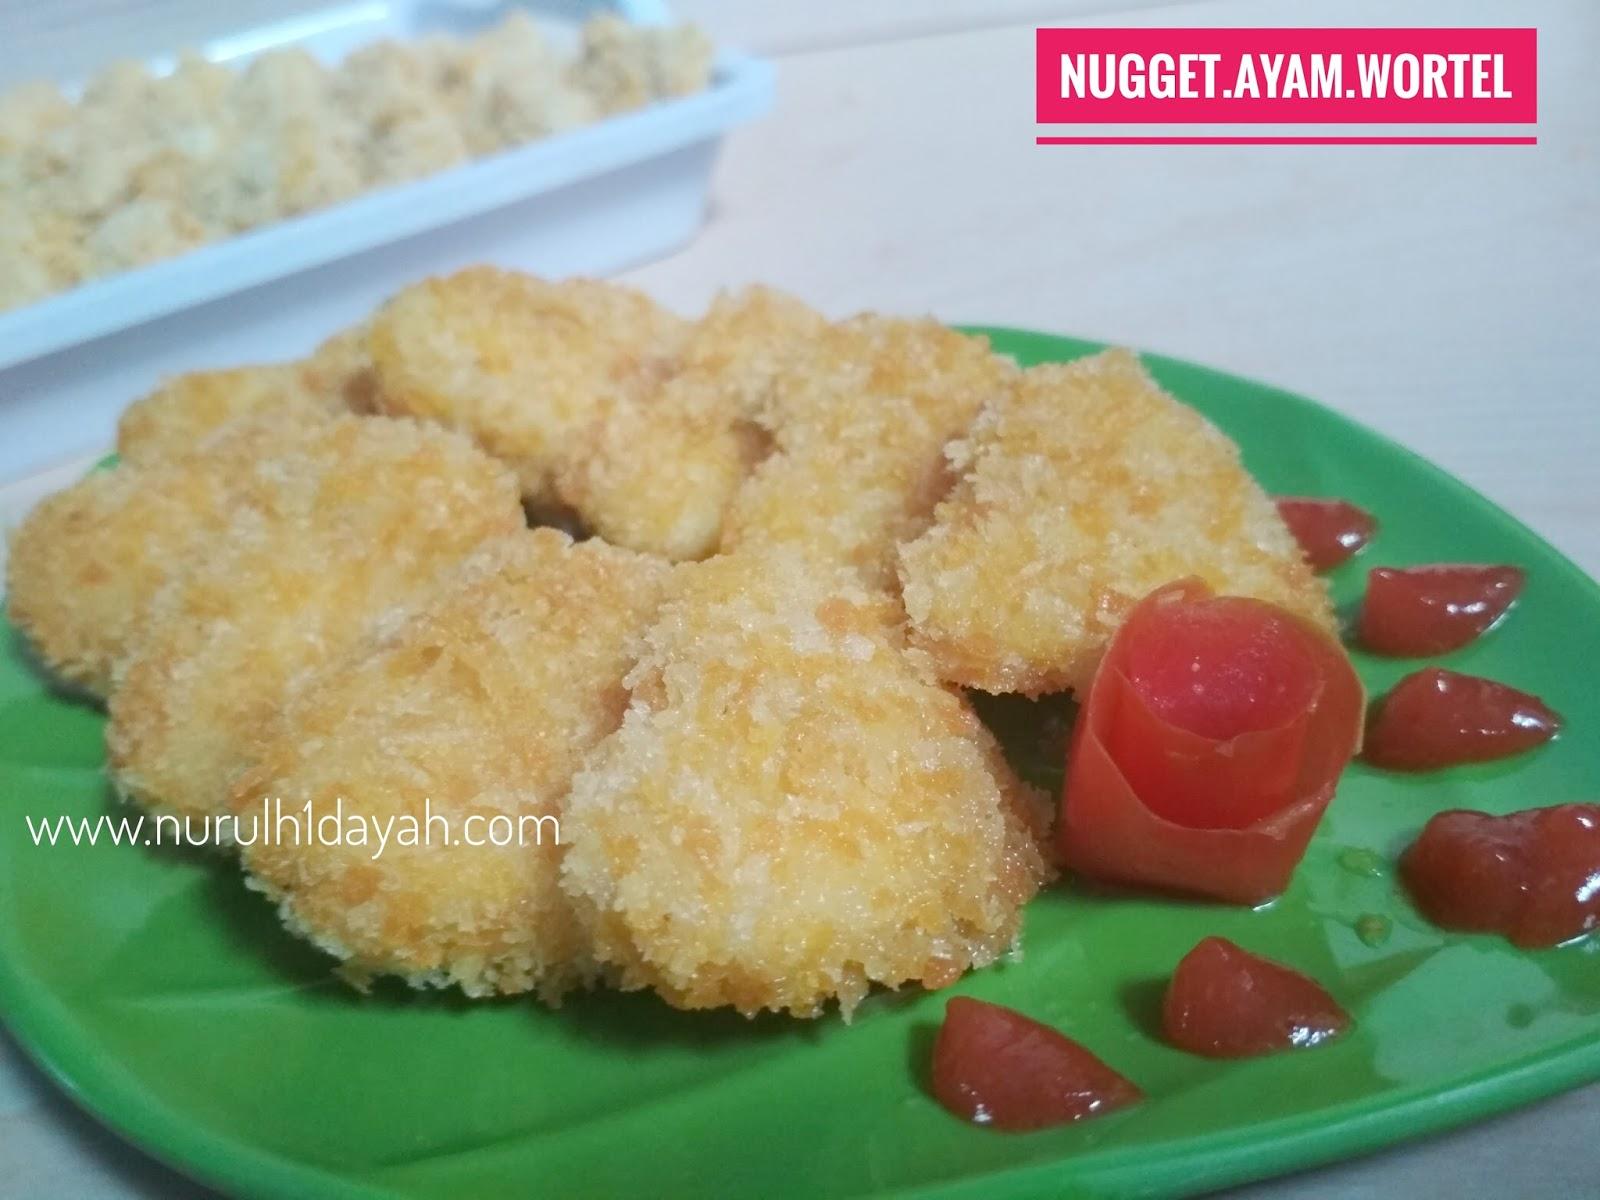 Resep Cara Membuat Nugget Ayam Wortel Sederhana Nurul Hidayah